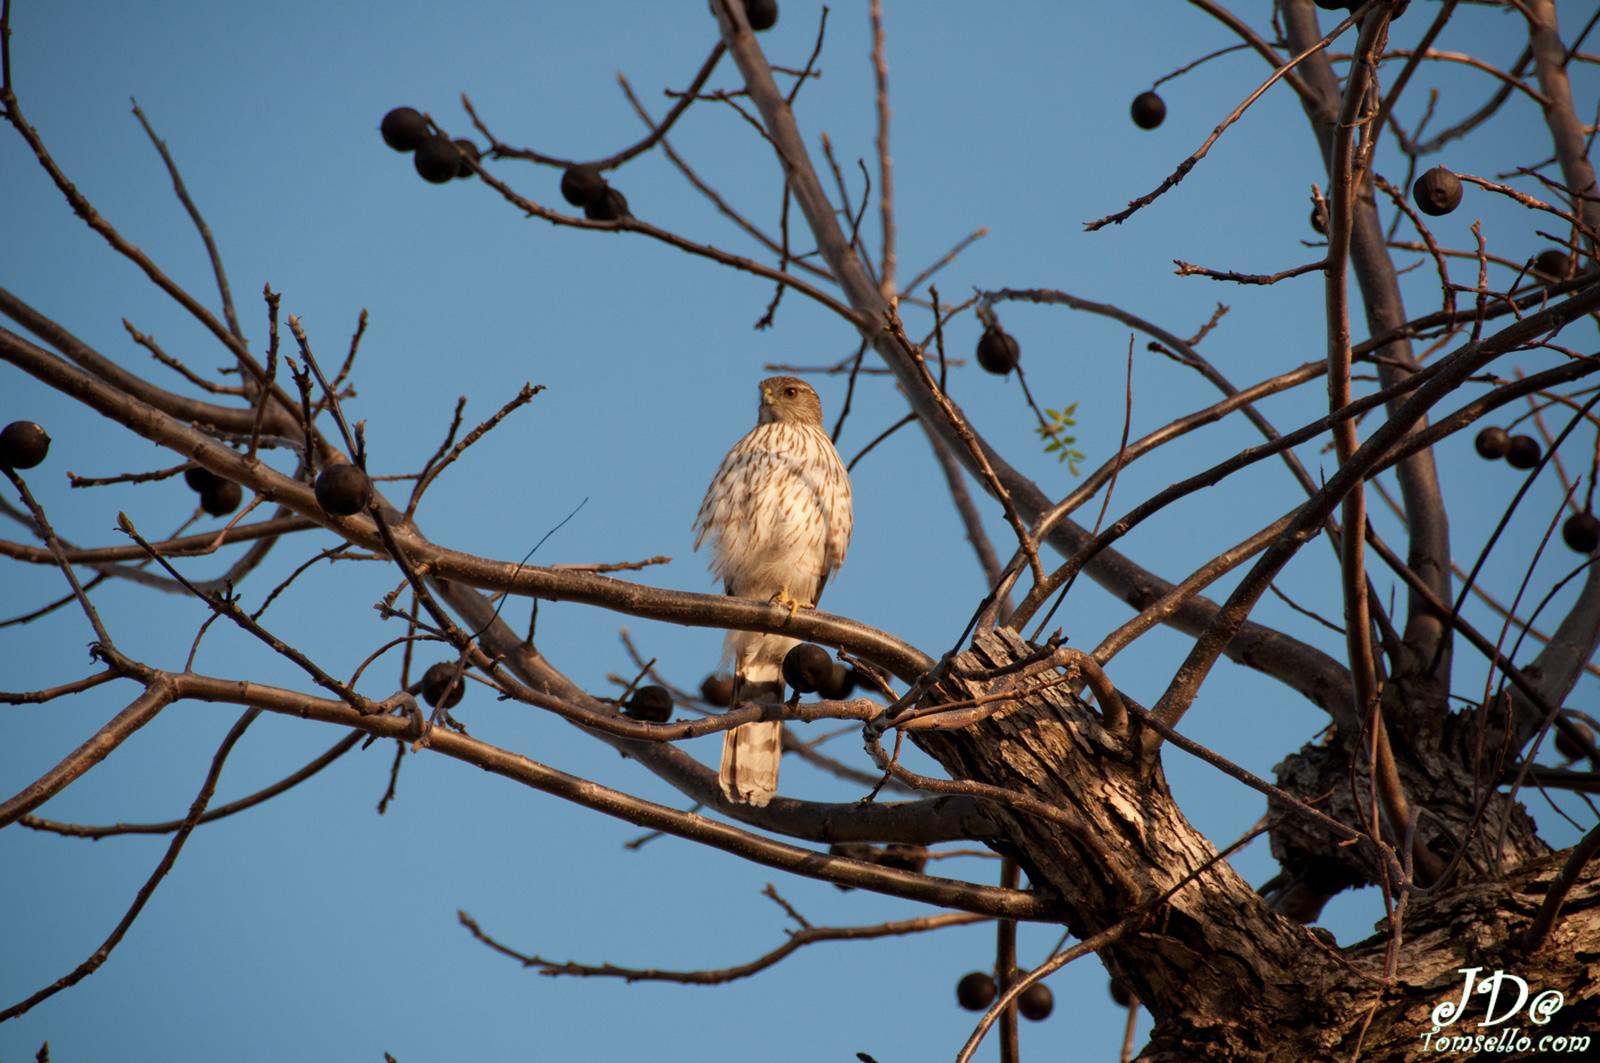 Sharp-shinned Hawk. Joanne Tomsello/Audubon Photography Awards